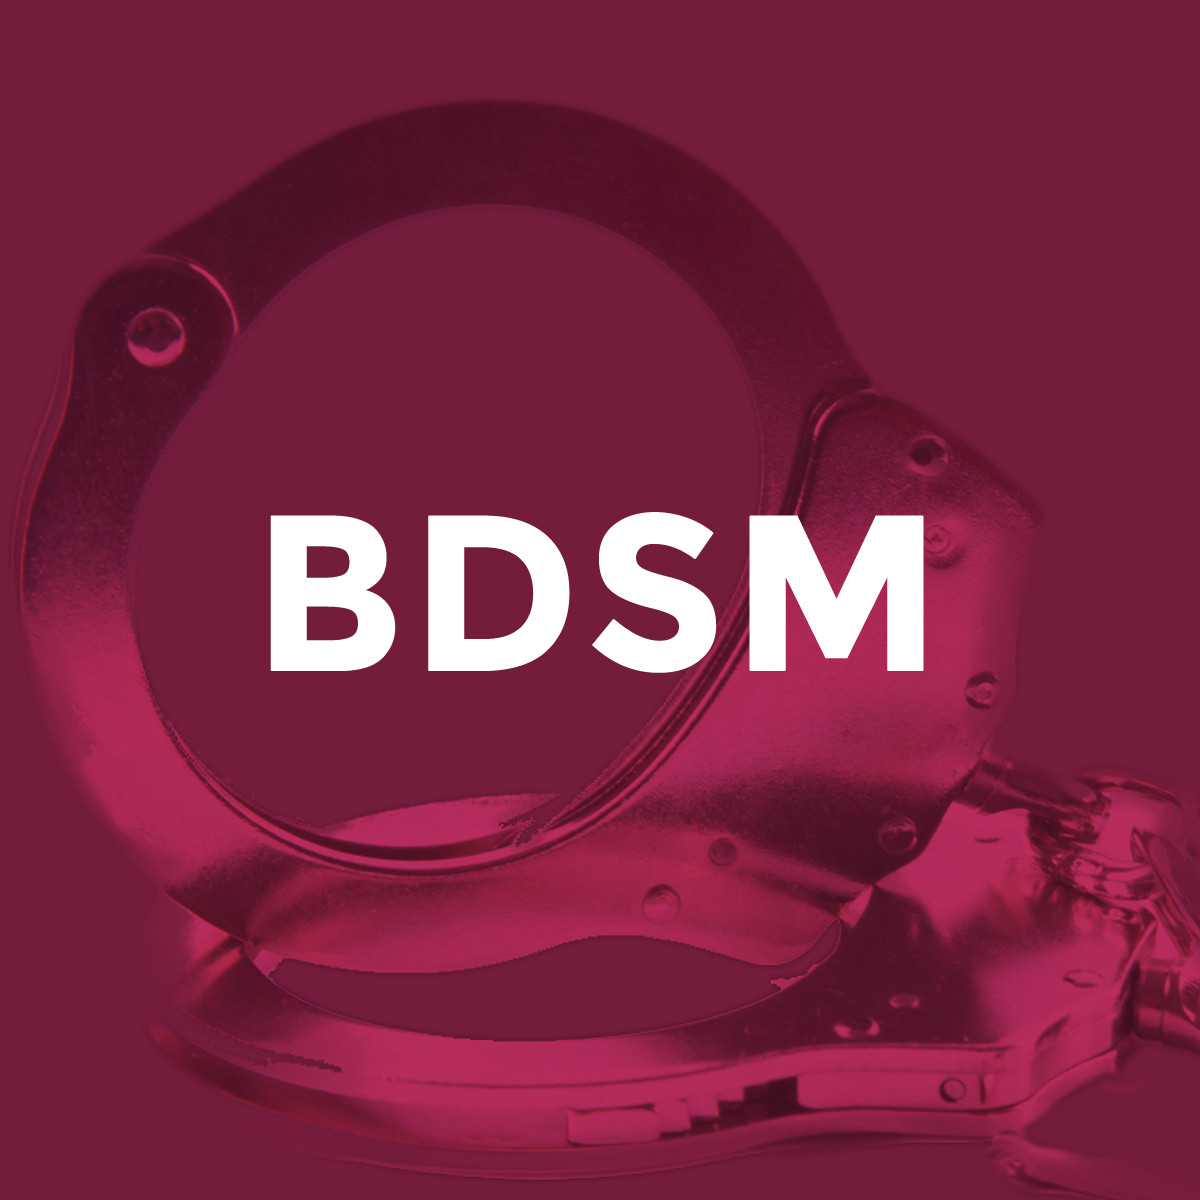 Section bdsm